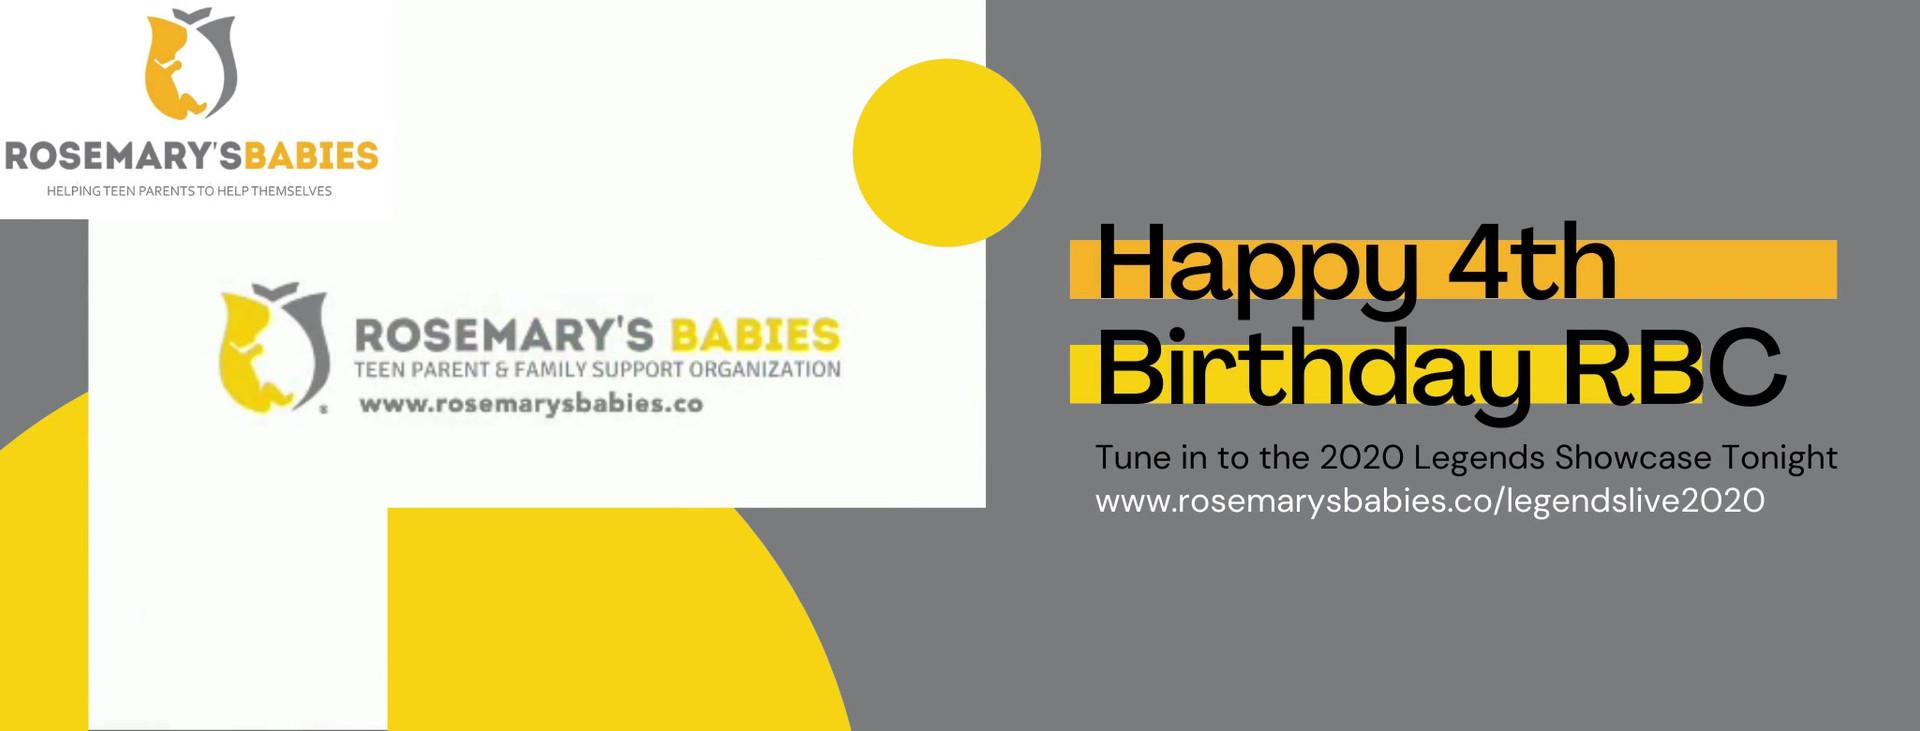 Happy 4th Birthday RBC (1).mp4